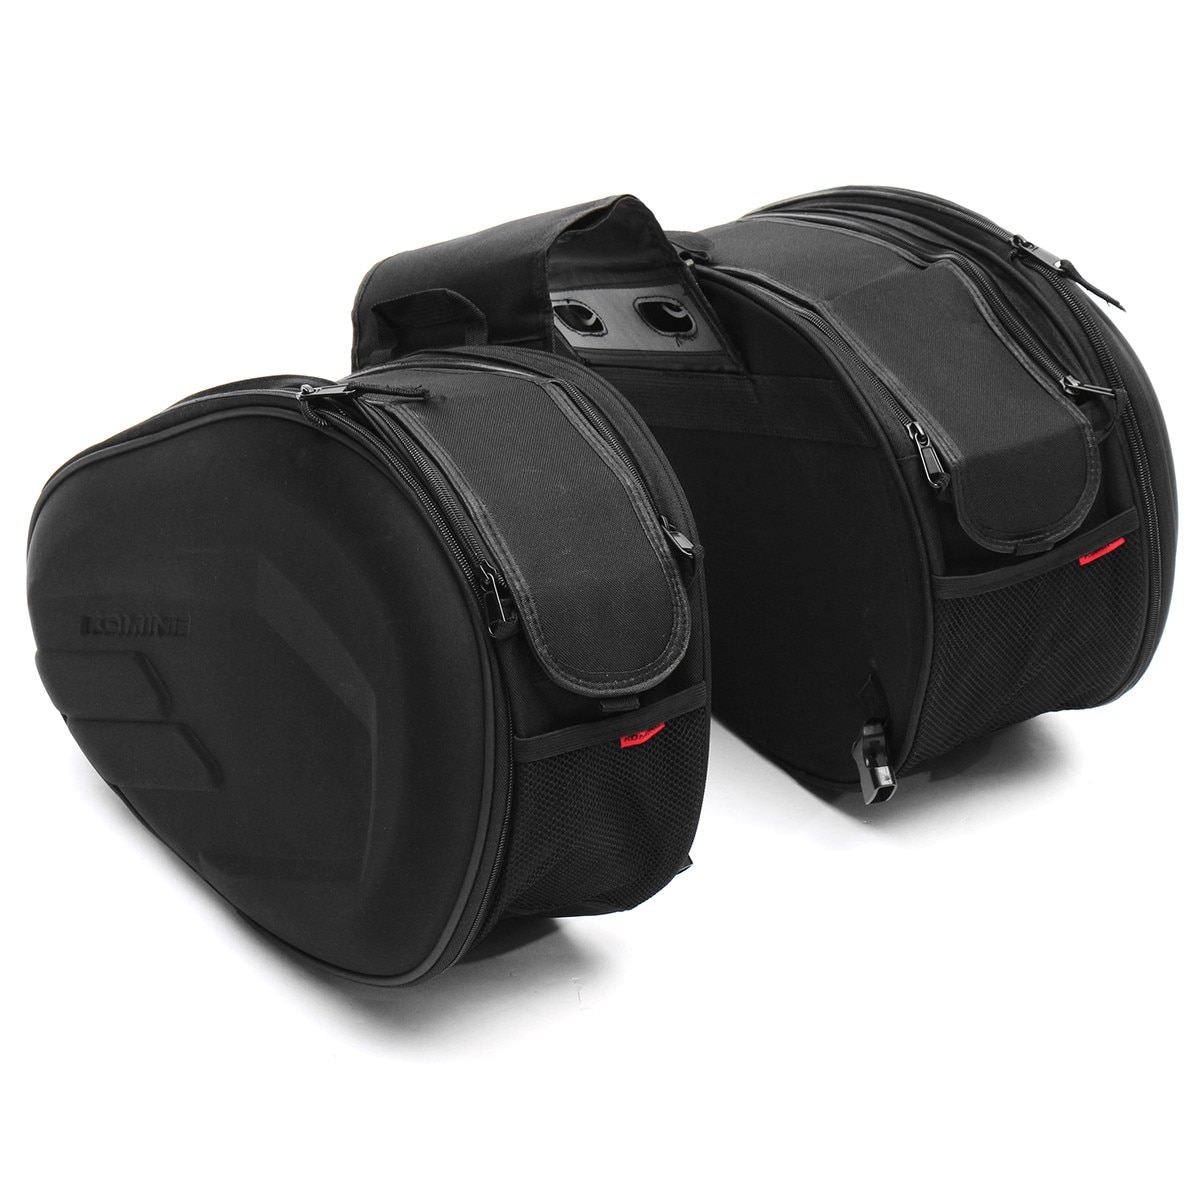 Bolso de Moto impermeable carrera de carreras casco de motocicleta bolsas de viaje maleta alforjas impermeable bolsa de asiento trasero de motocicleta Mochila Moto